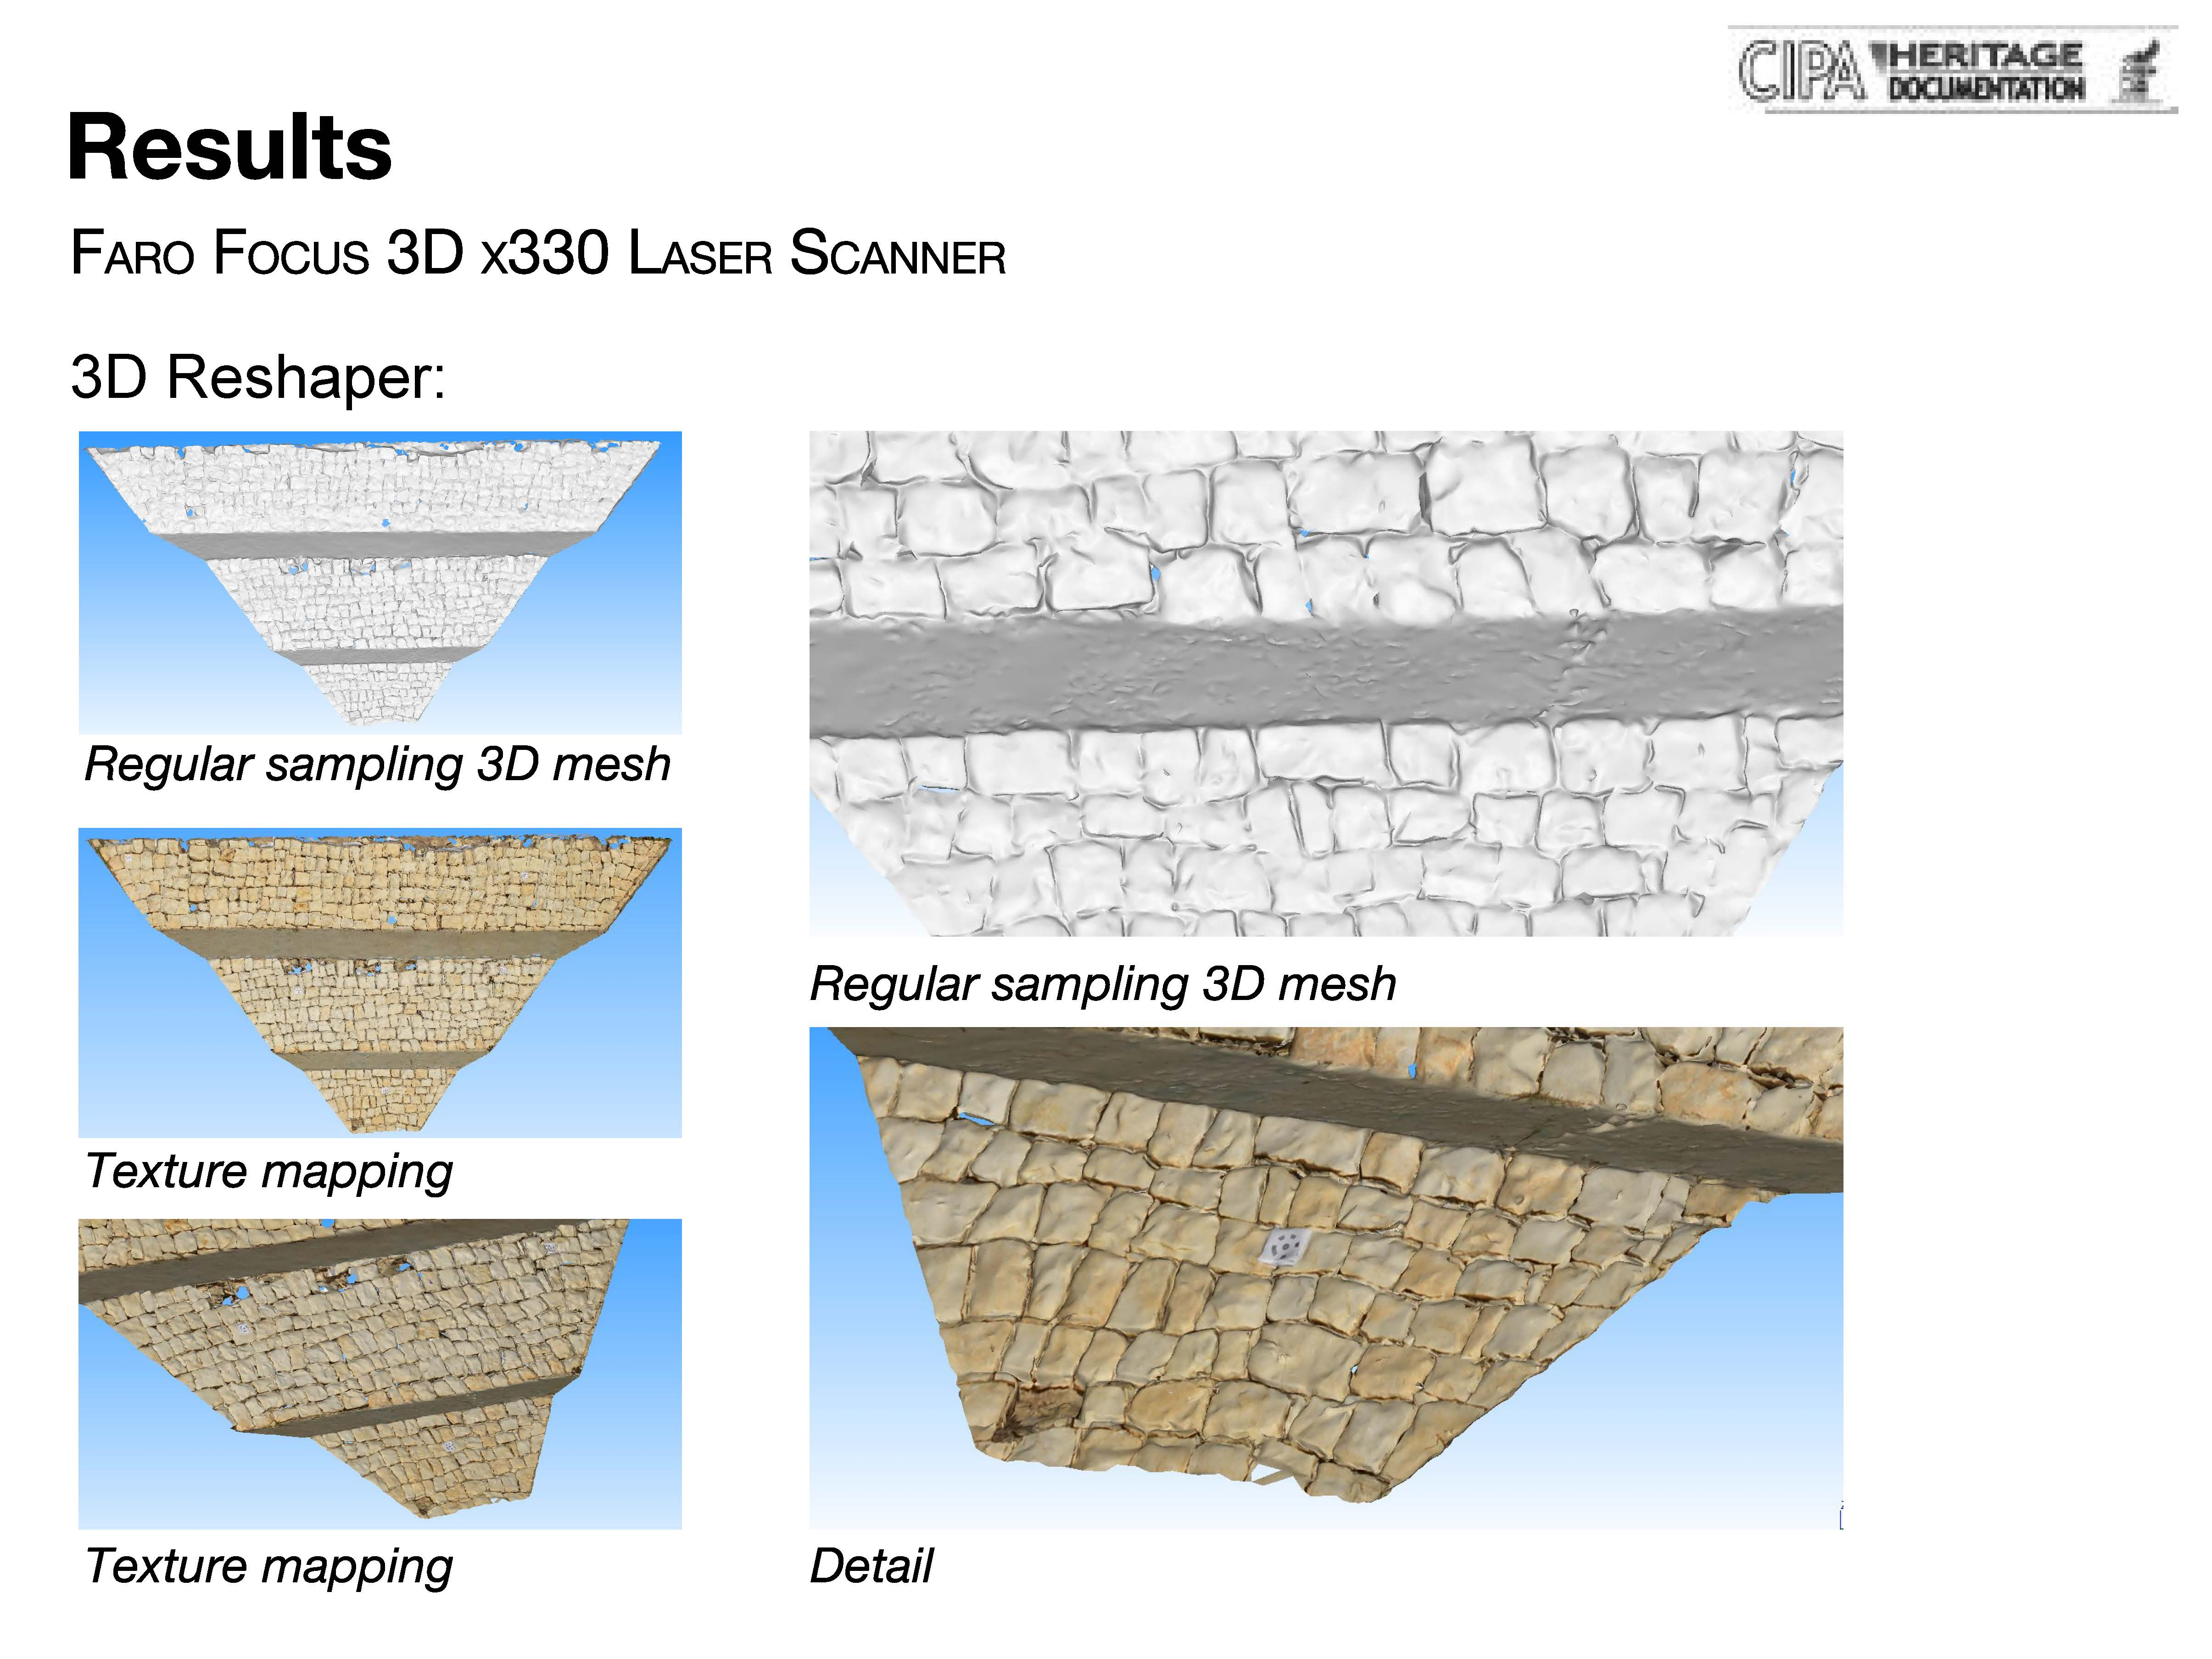 3D Reshaper - Mesh and texture